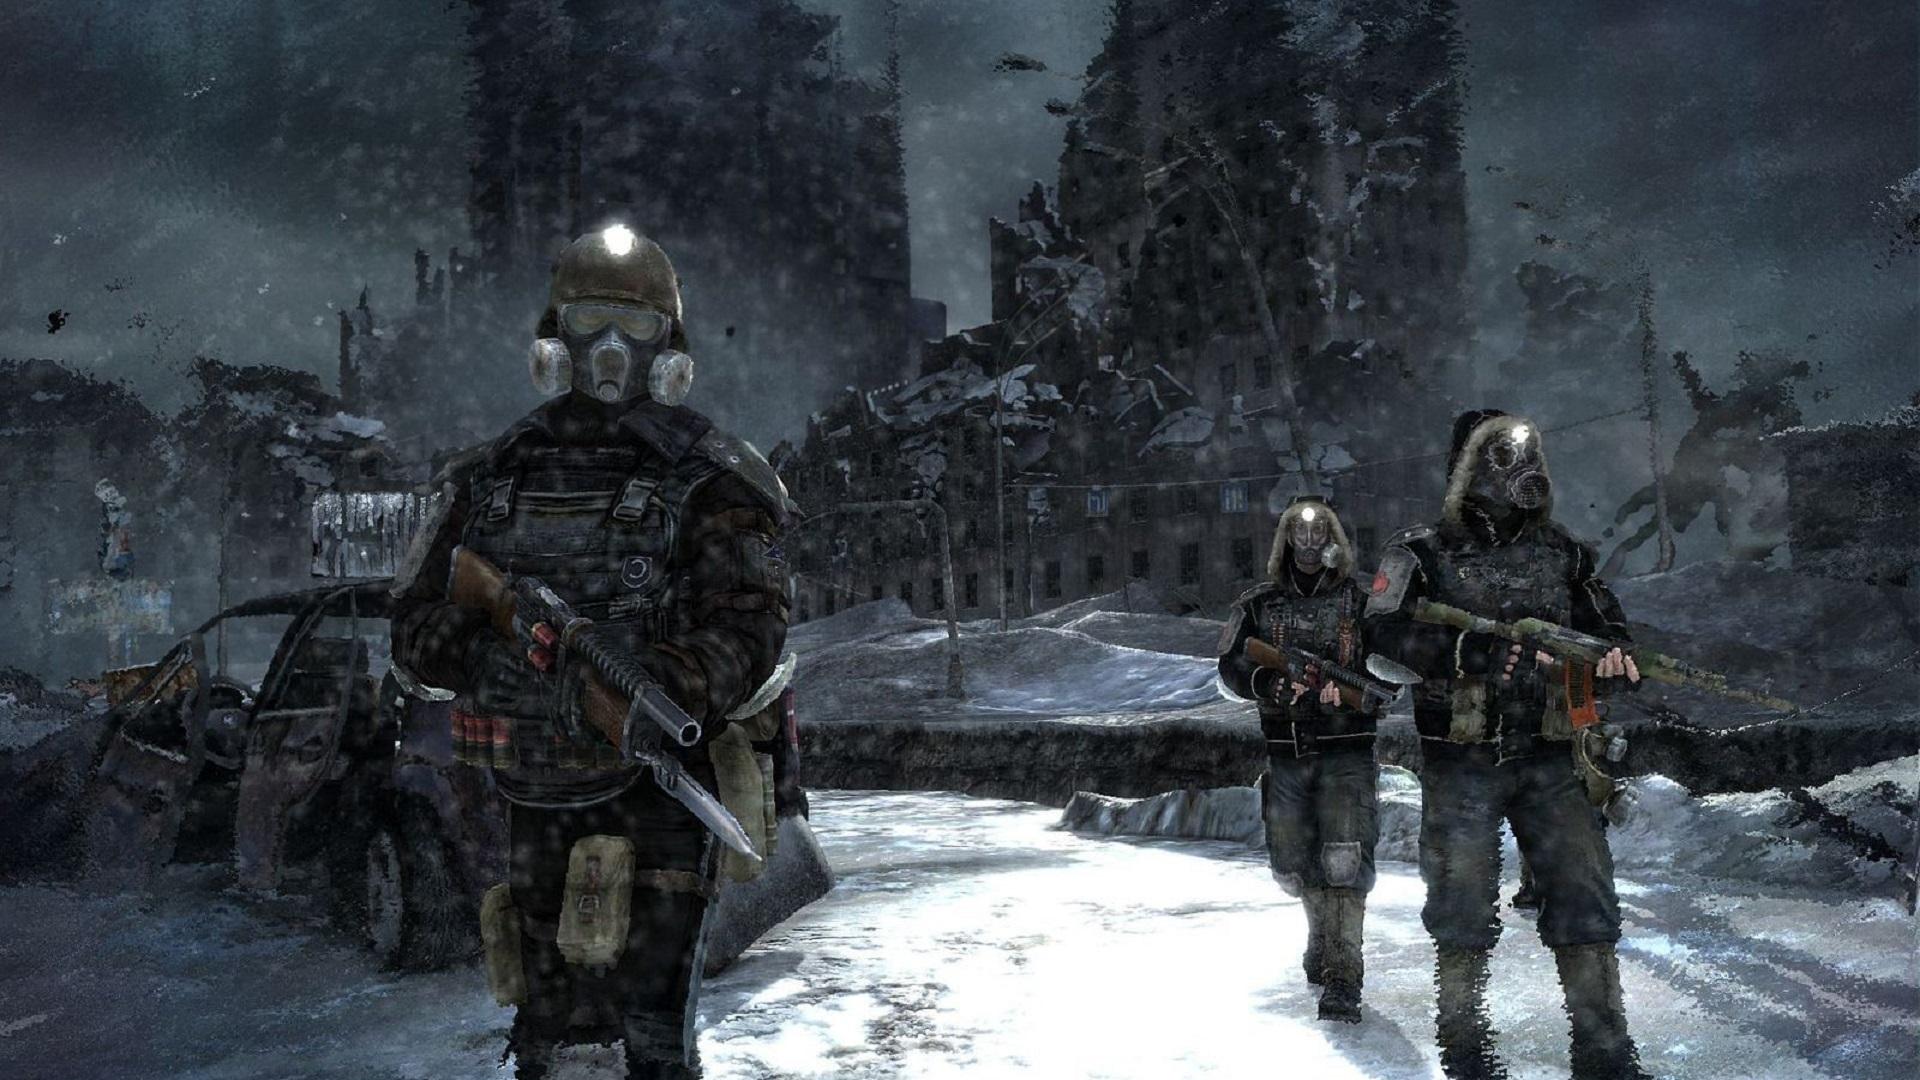 General 1920x1080 gas masks apocalyptic futuristic dark ruin weapon Metro 2033